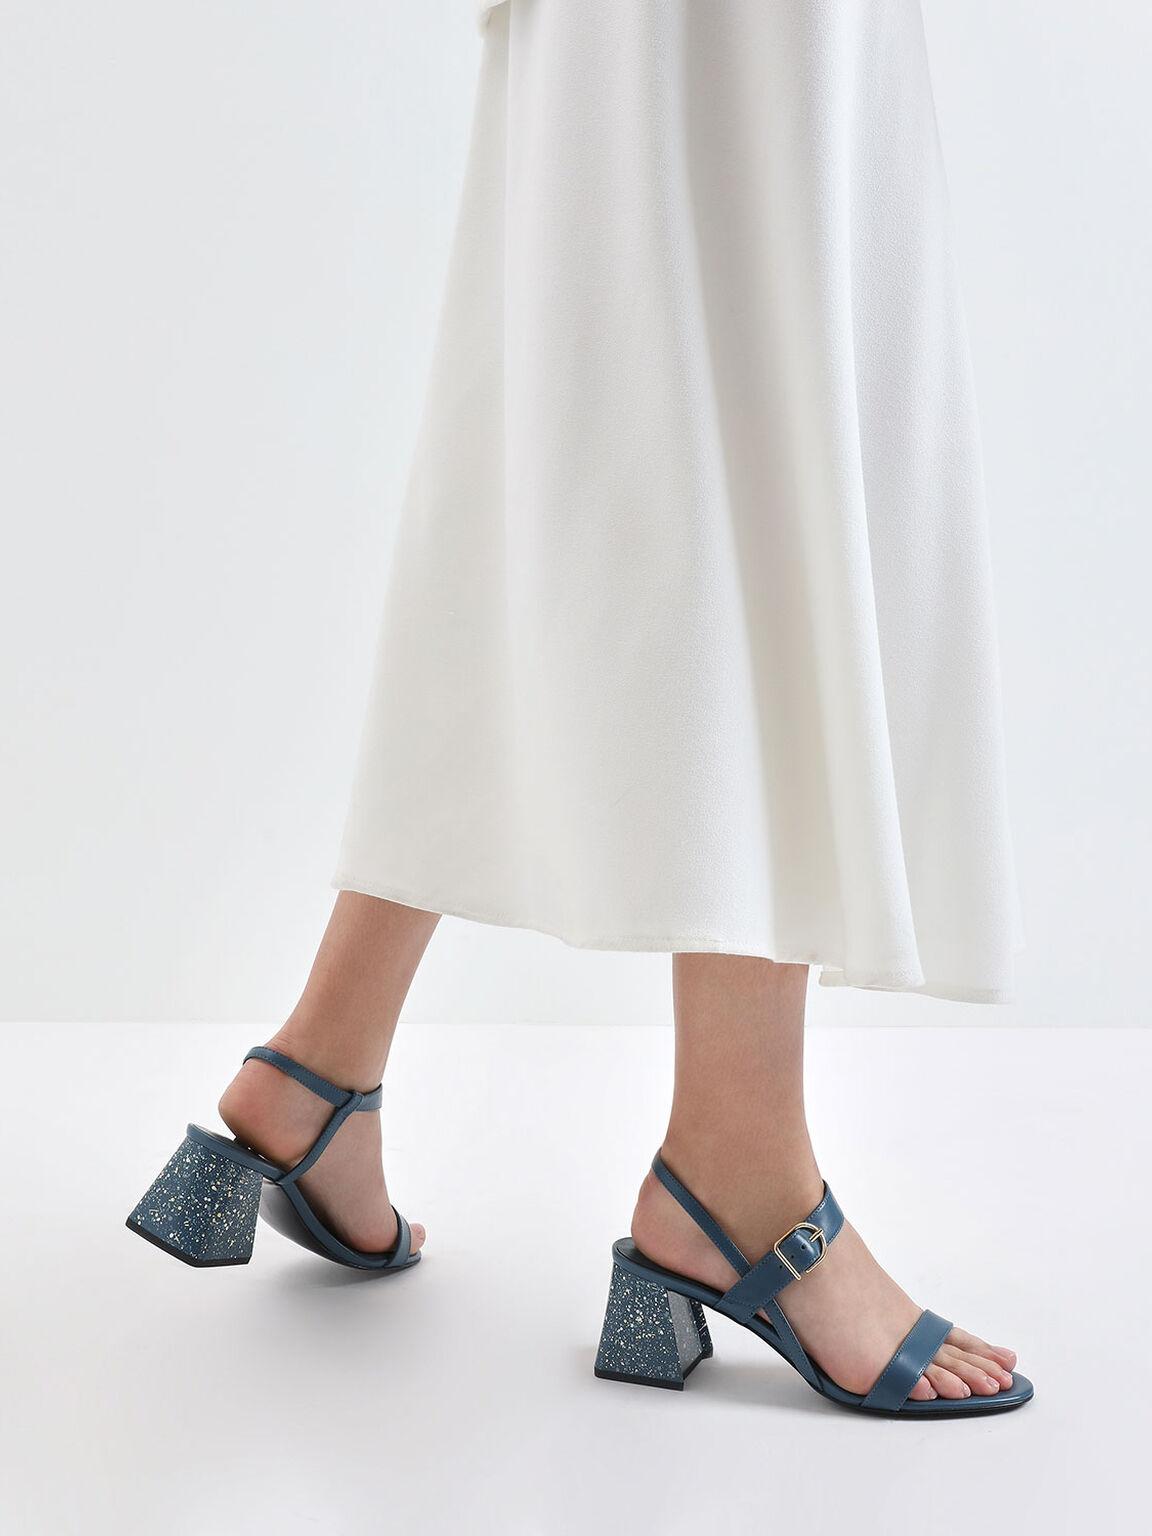 Terrazzo Print Flare Block Heel Sandals, Blue, hi-res